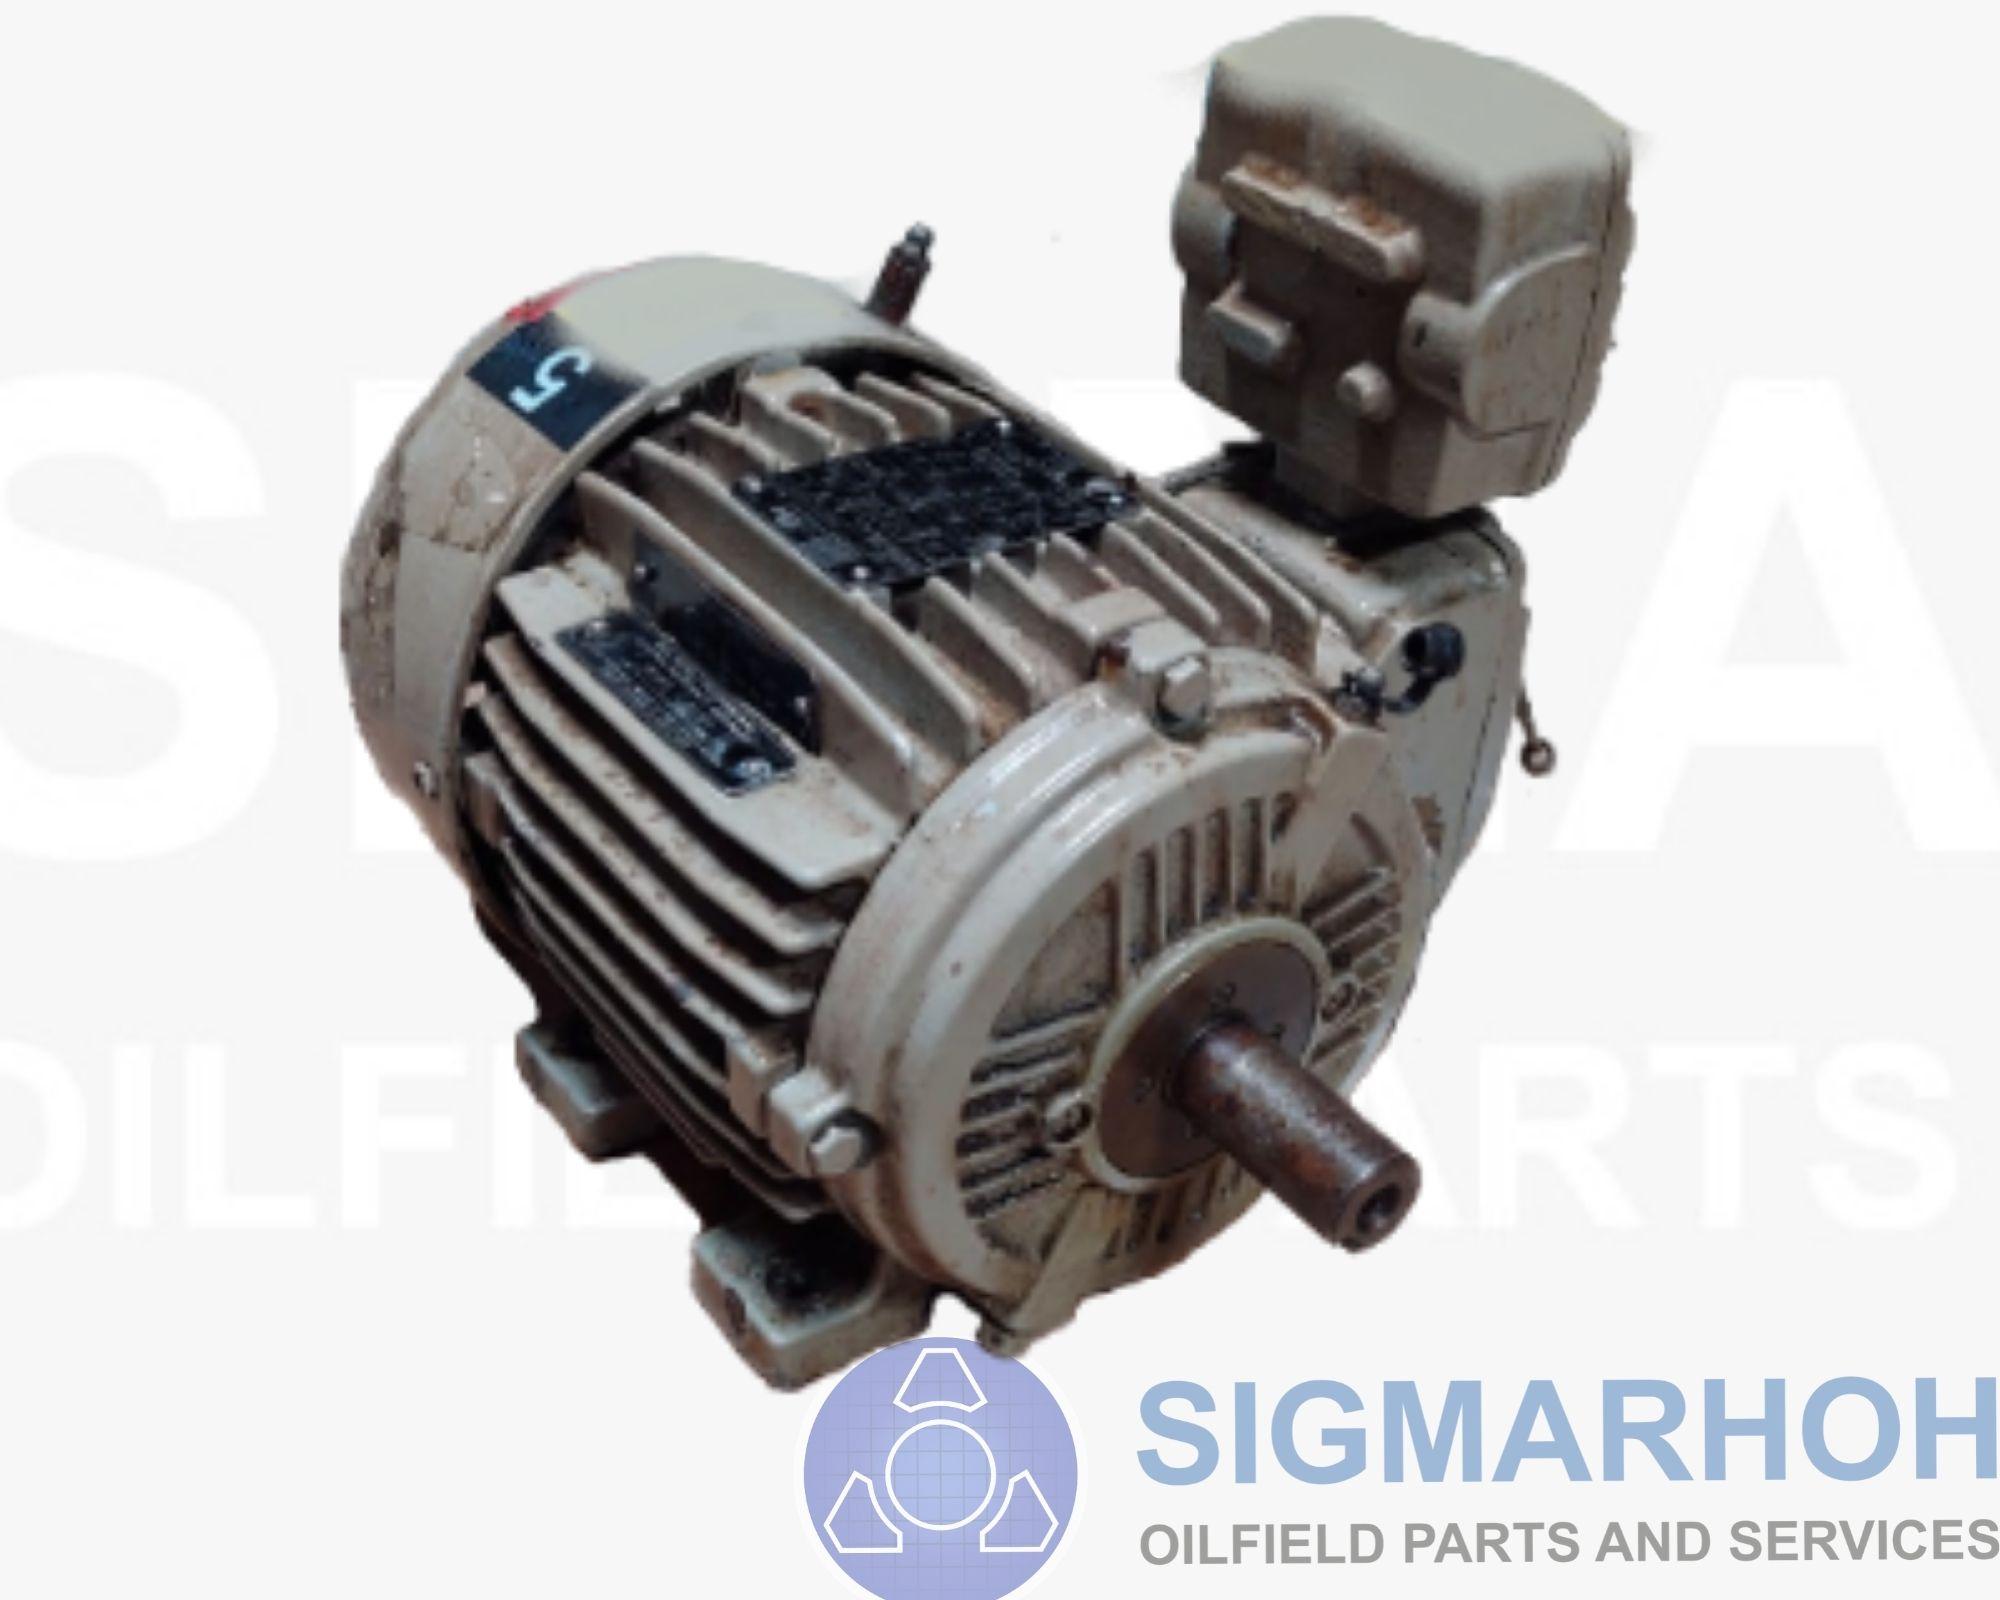 Motor Elétrico de Indução / Eletric Induction Engine